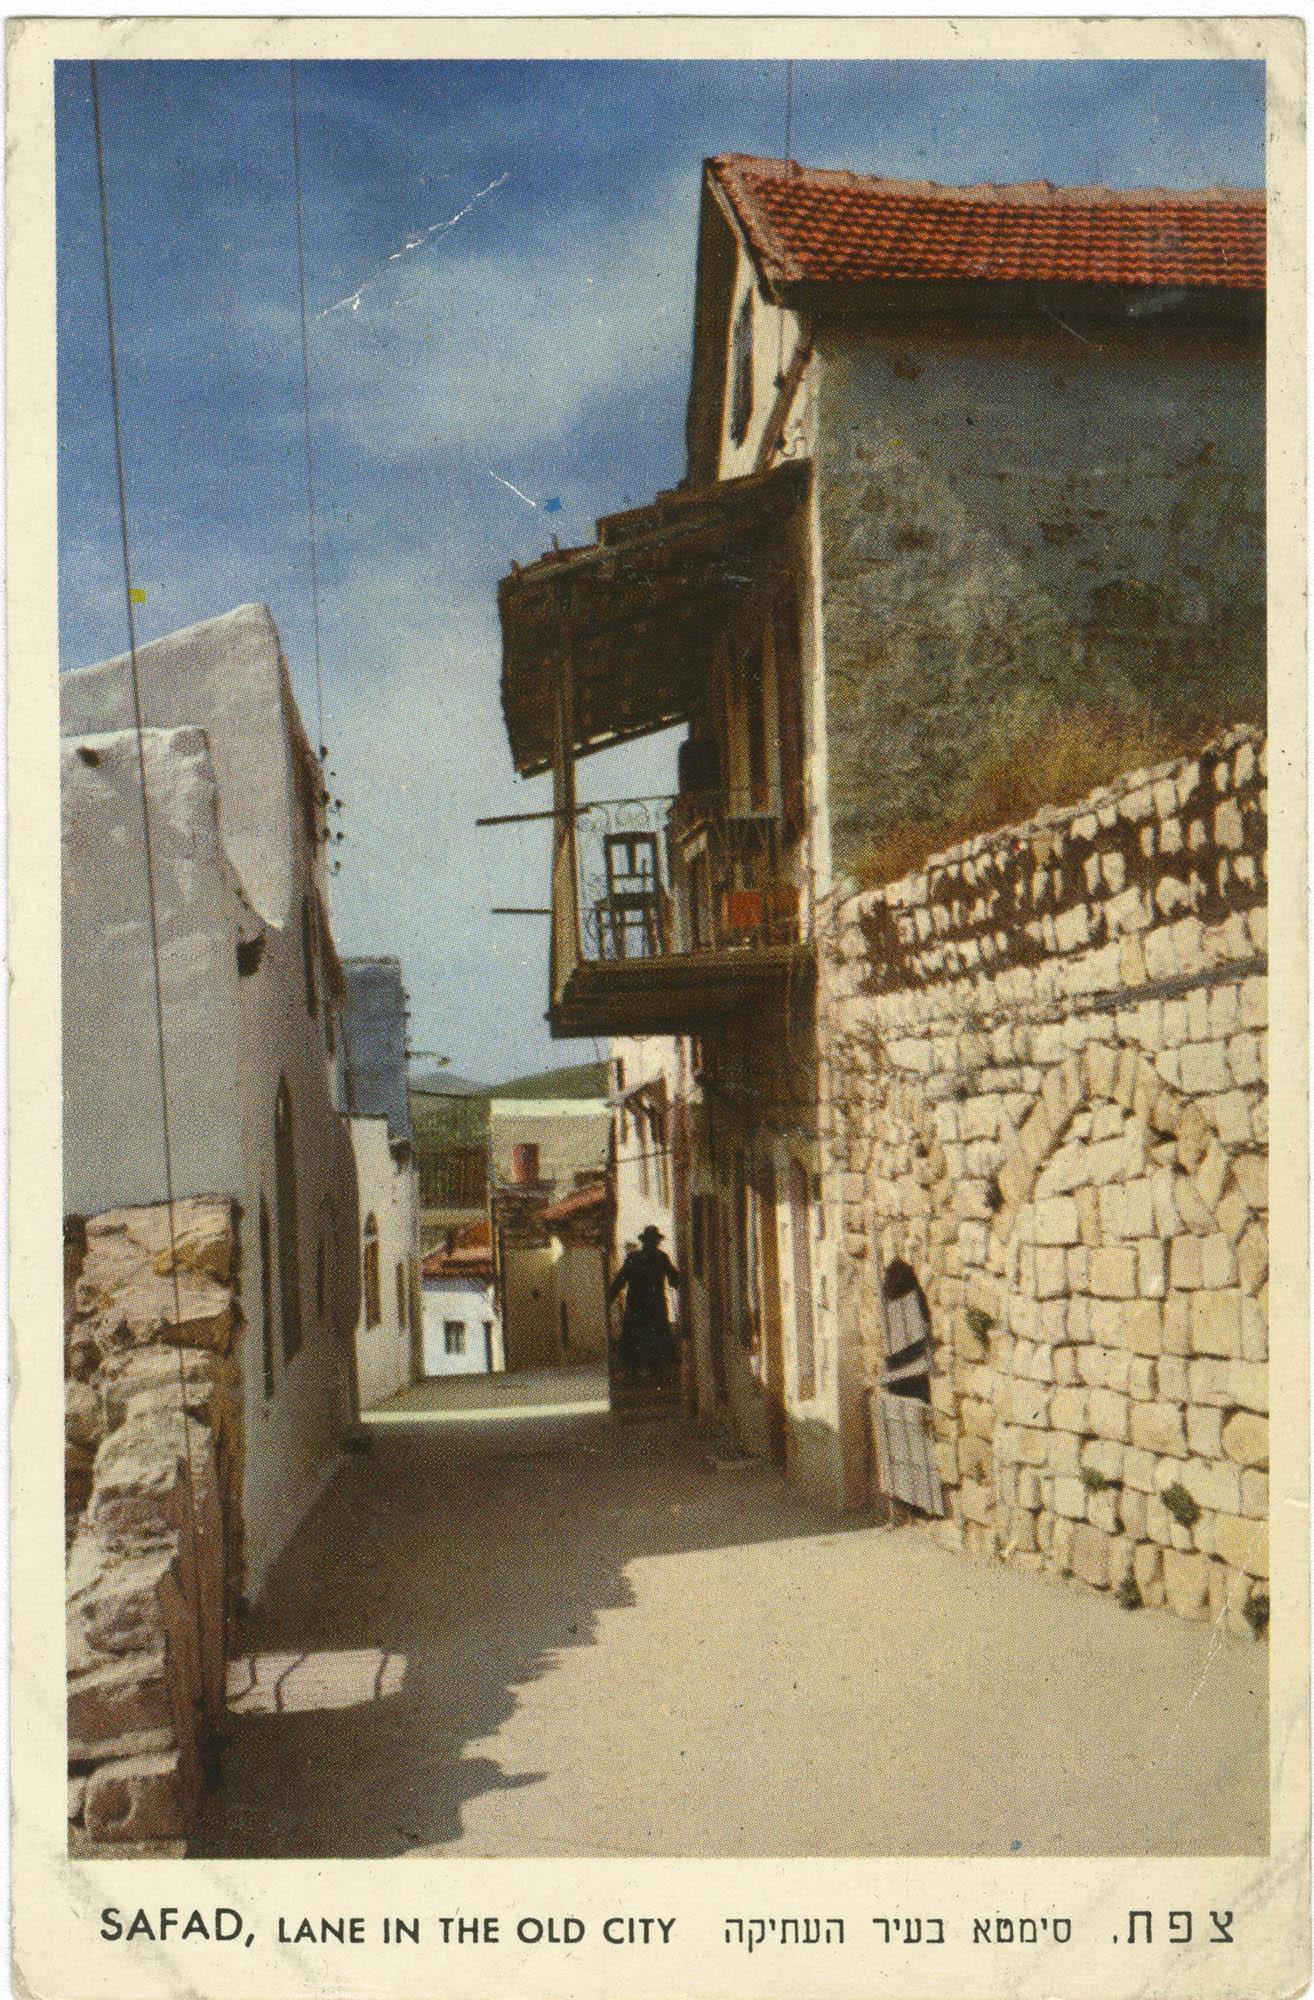 SAFAD, lane in the Old City / צפת, סימטא בעיר העתיקה